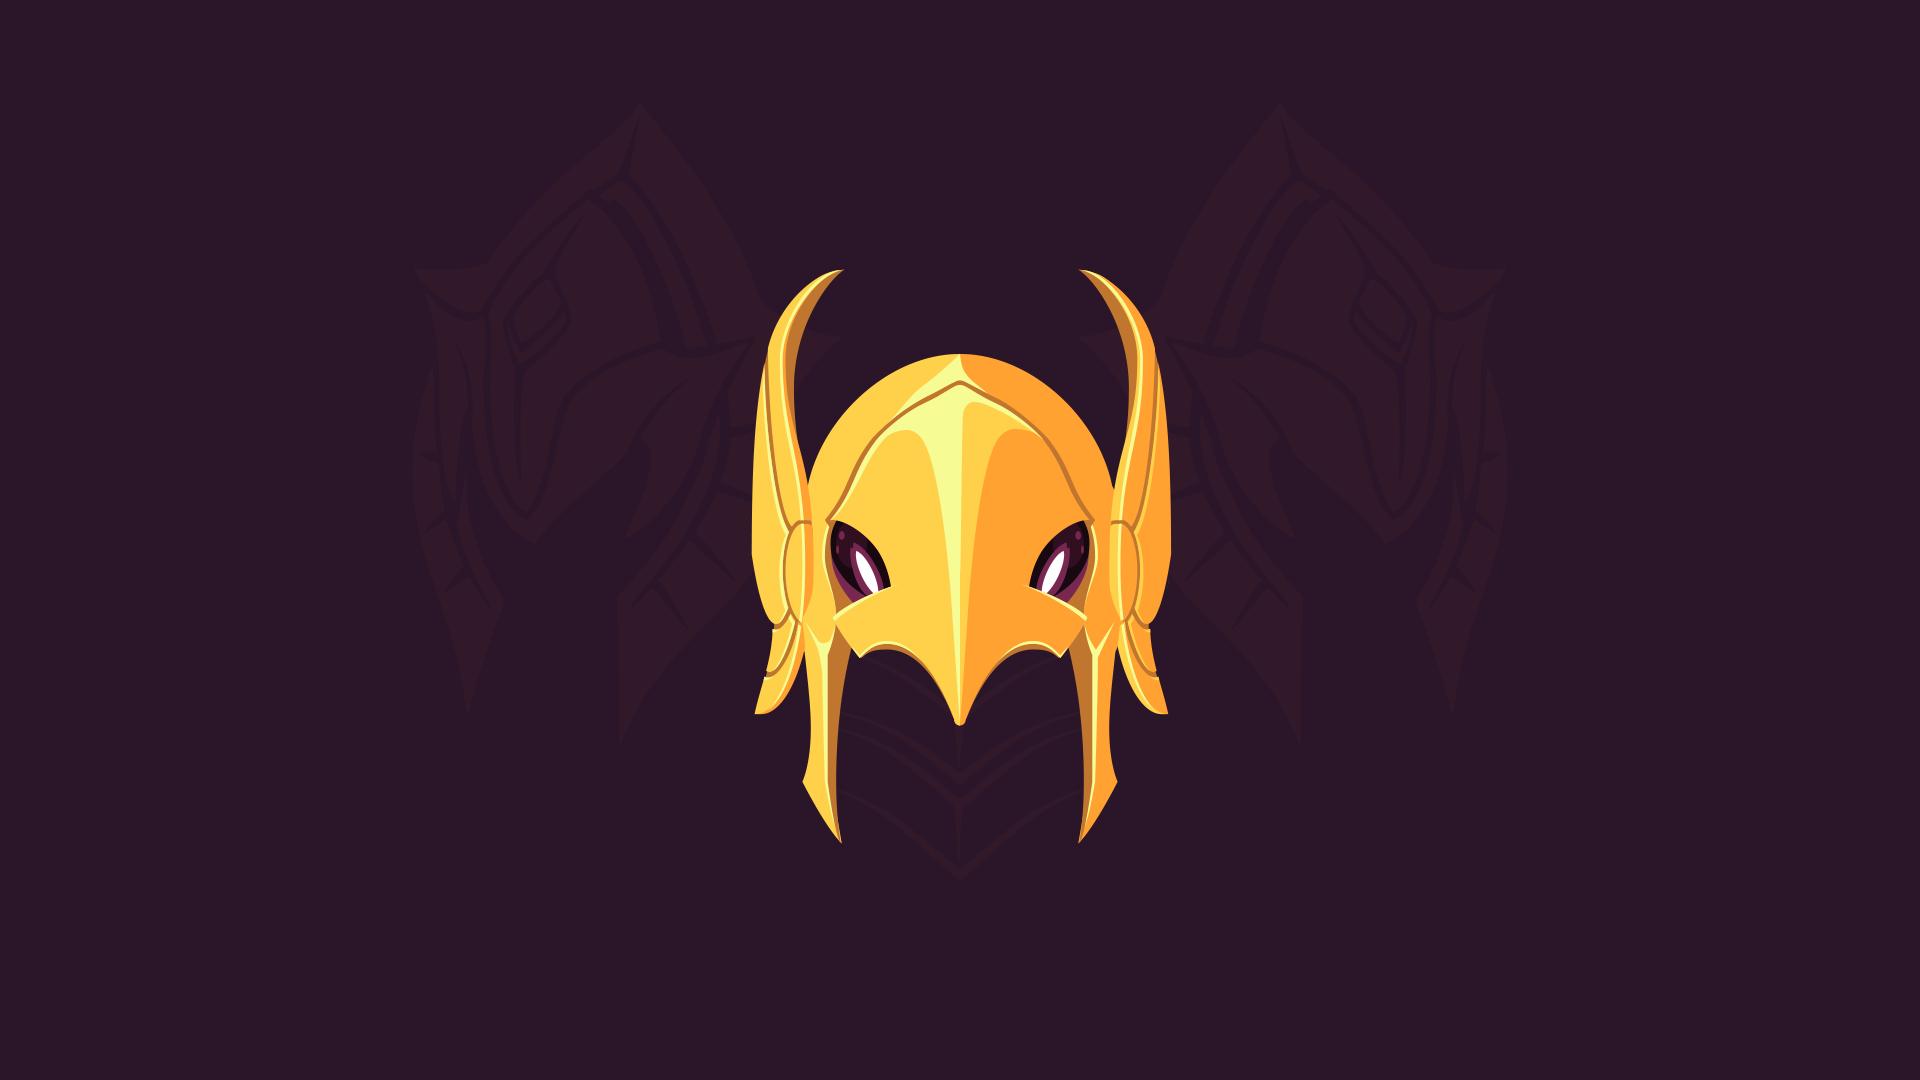 Wallpaper Illustration Video Games League Of Legends Logo